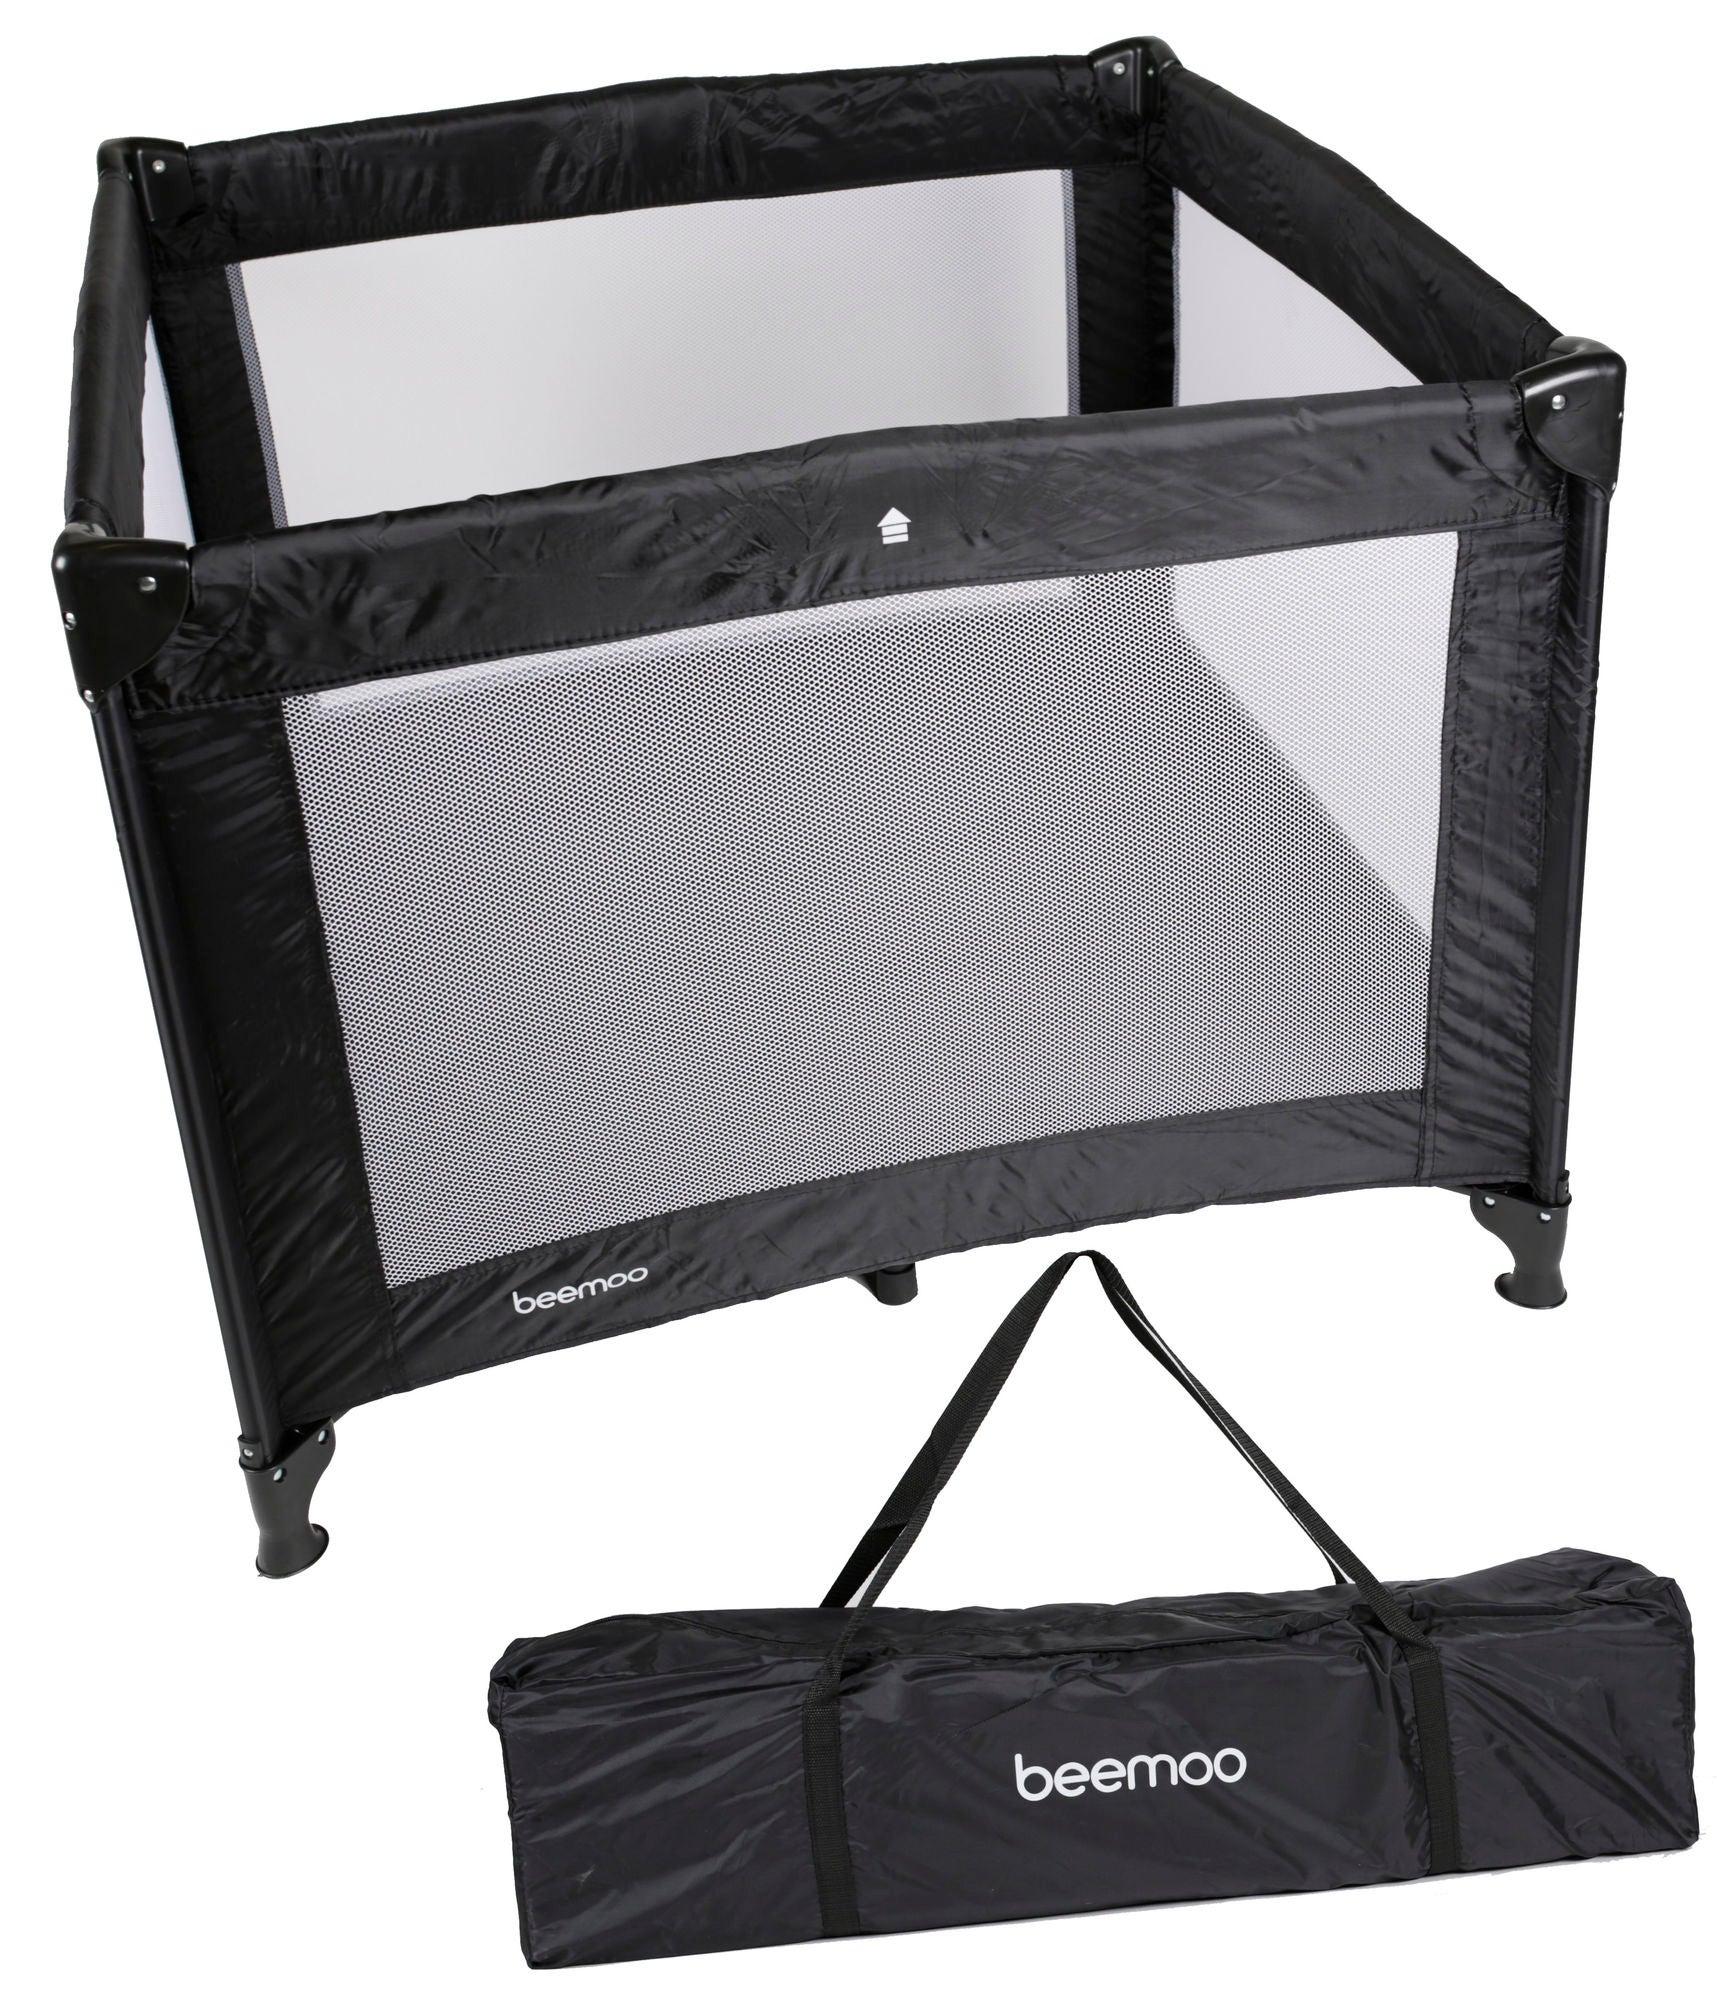 Beemoo Lekhage Svart 90x90cm